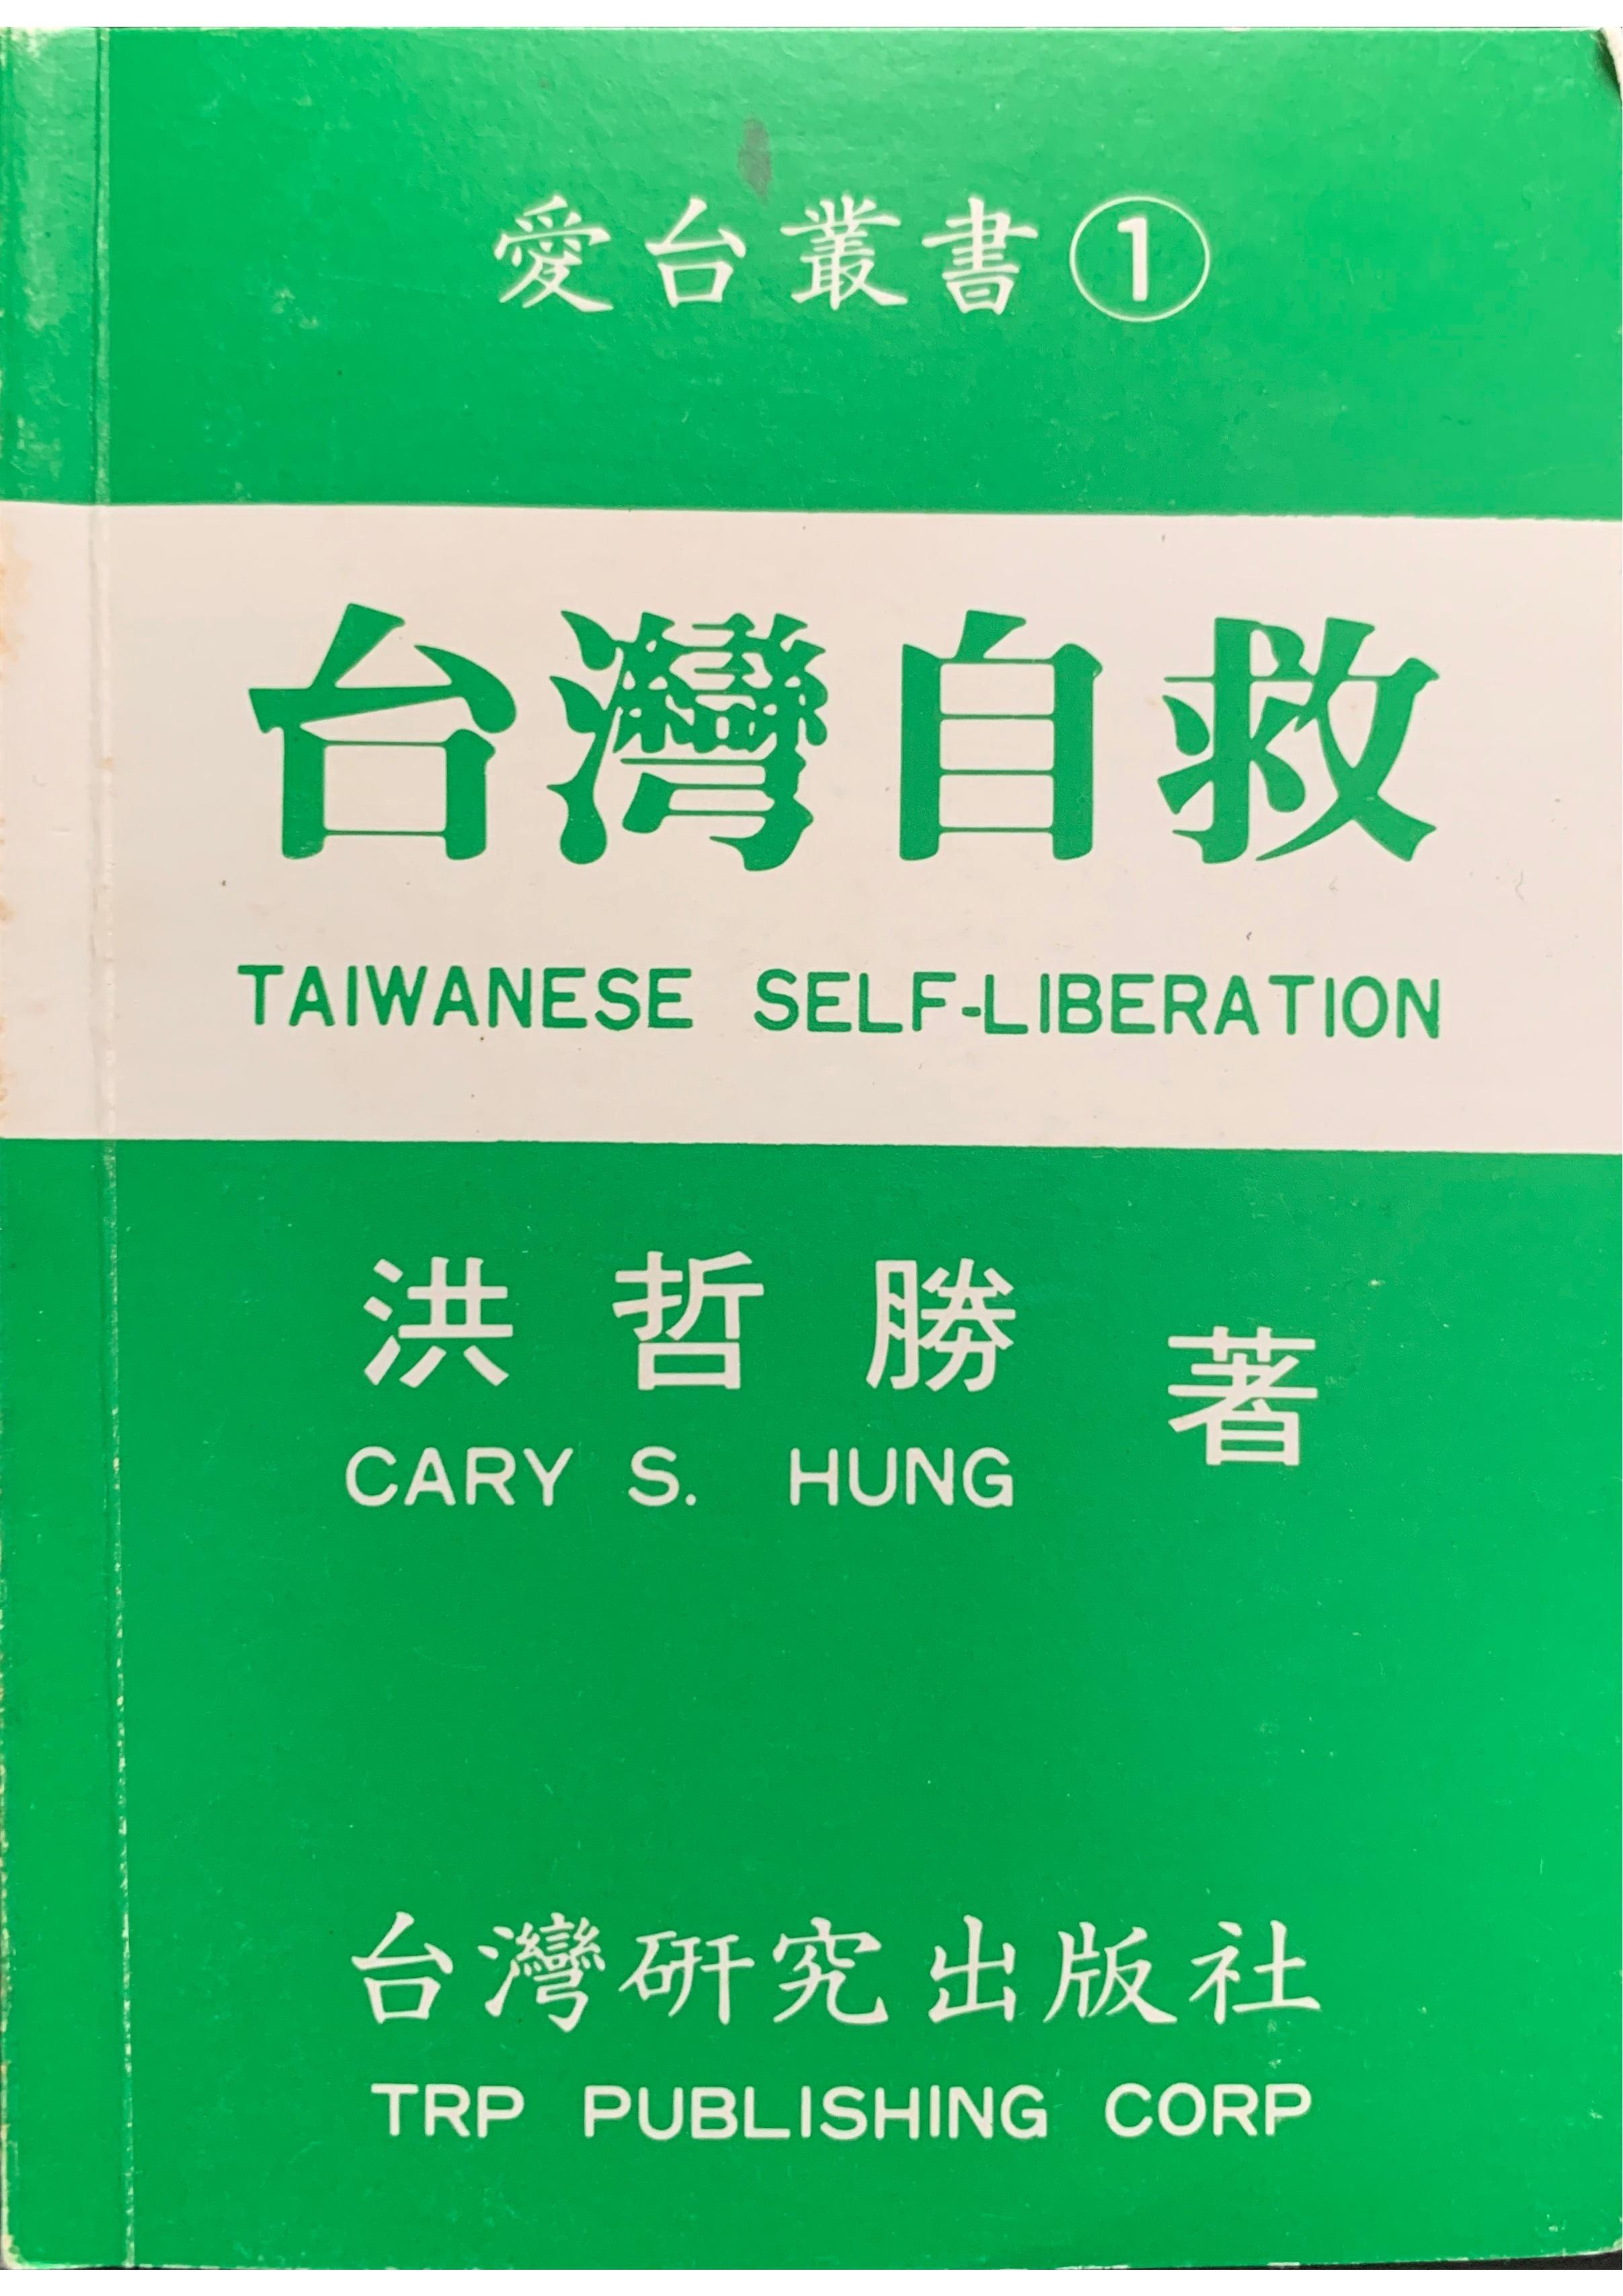 1320. 台灣自救 Taiwanese Self-Liberation/洪哲勝 Cary S. Hung/1986